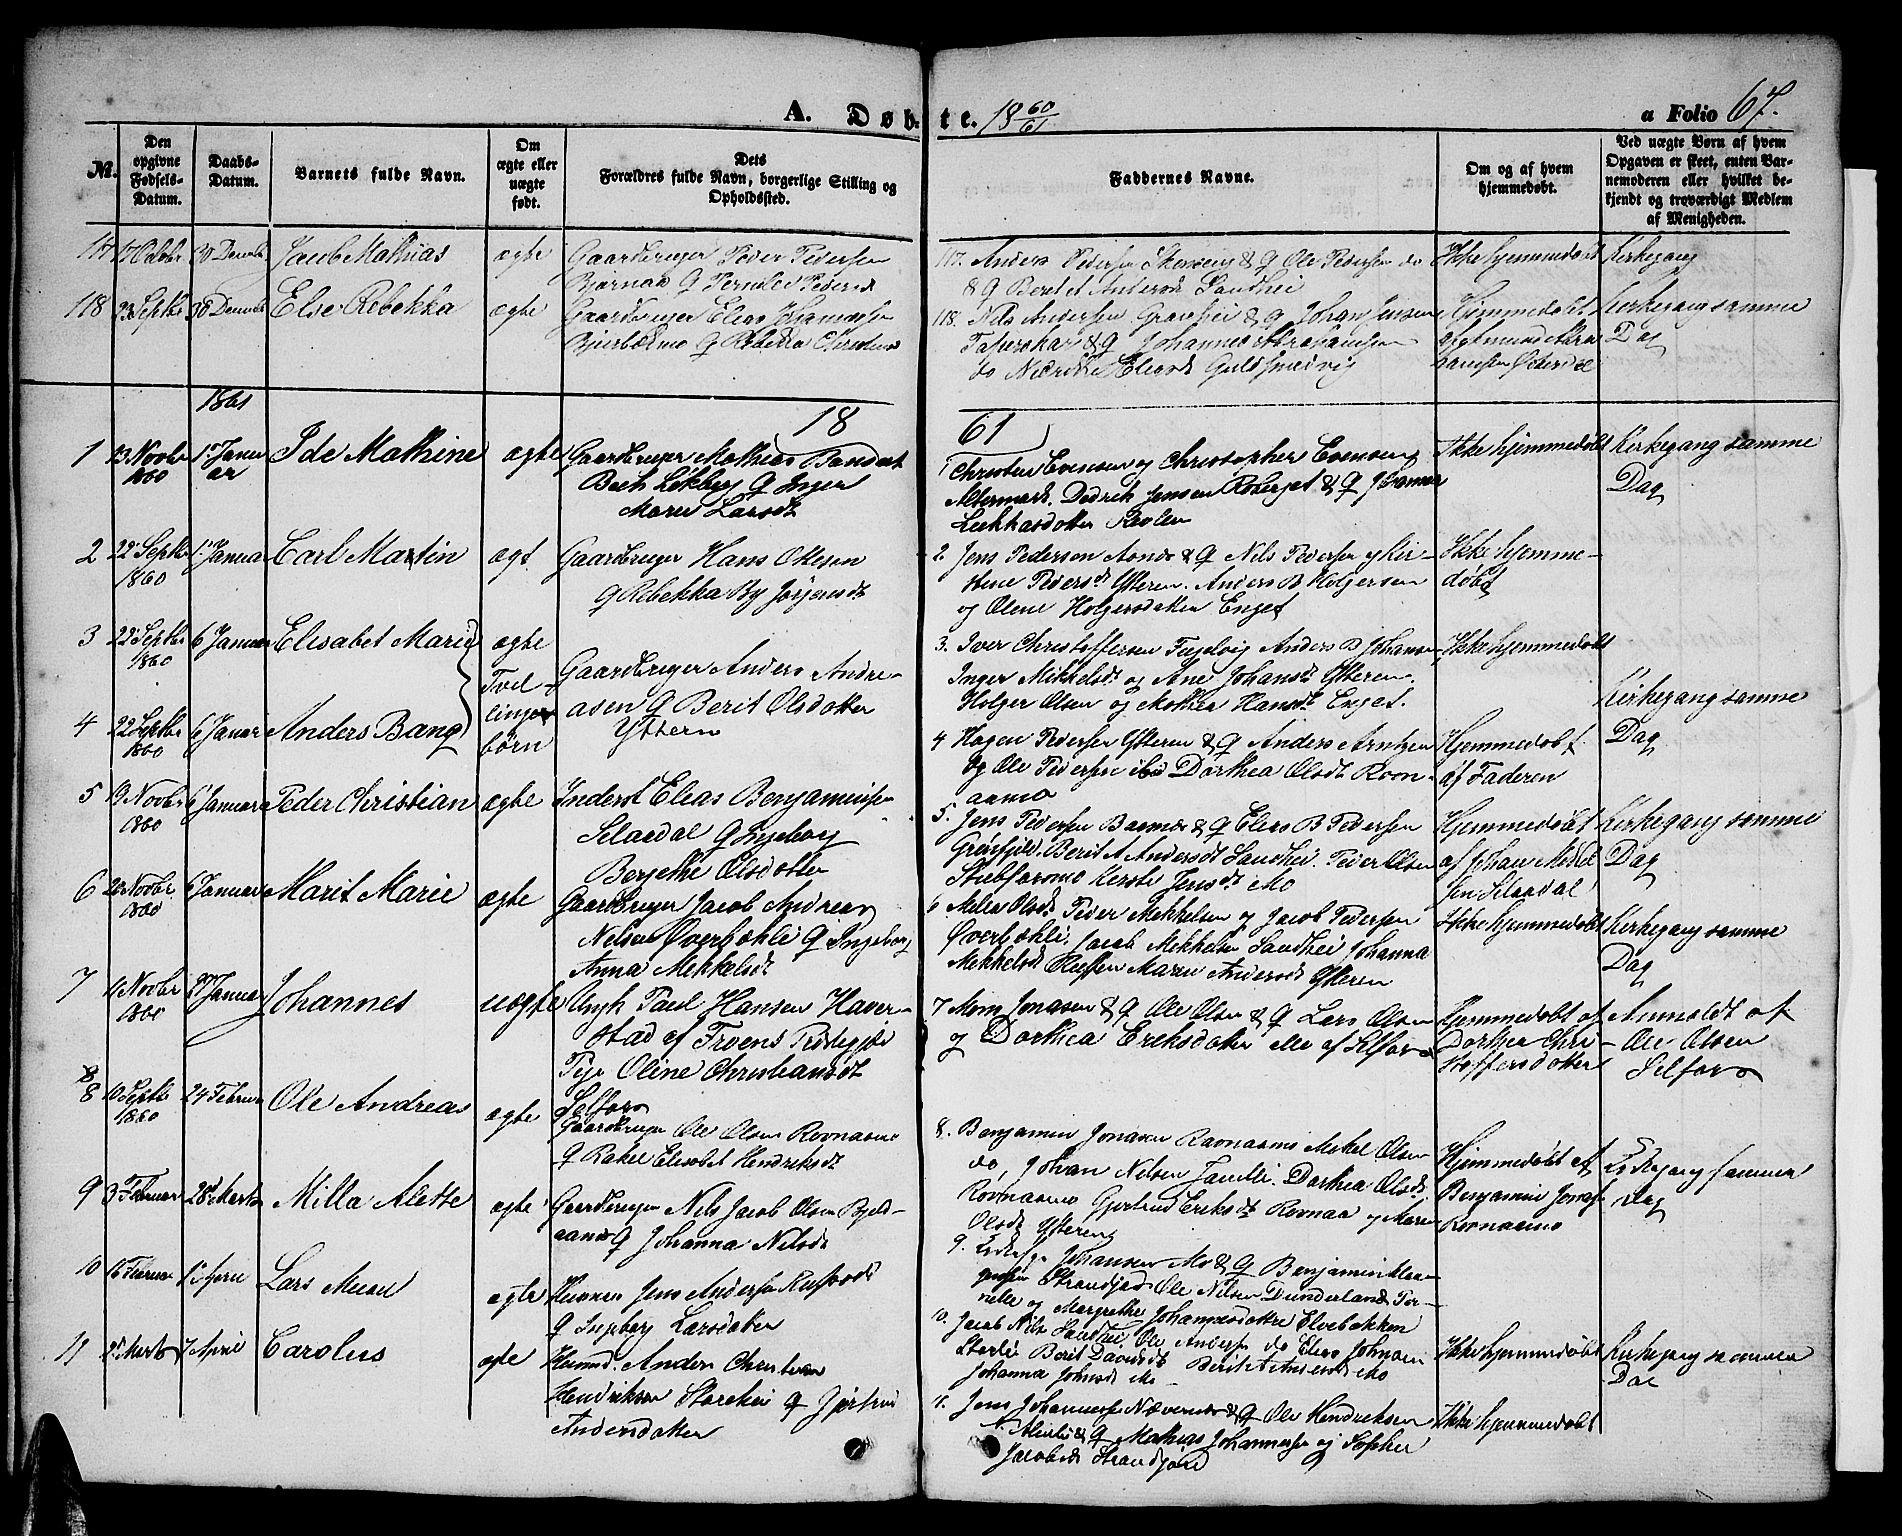 SAT, Ministerialprotokoller, klokkerbøker og fødselsregistre - Nordland, 827/L0414: Klokkerbok nr. 827C03, 1853-1865, s. 67